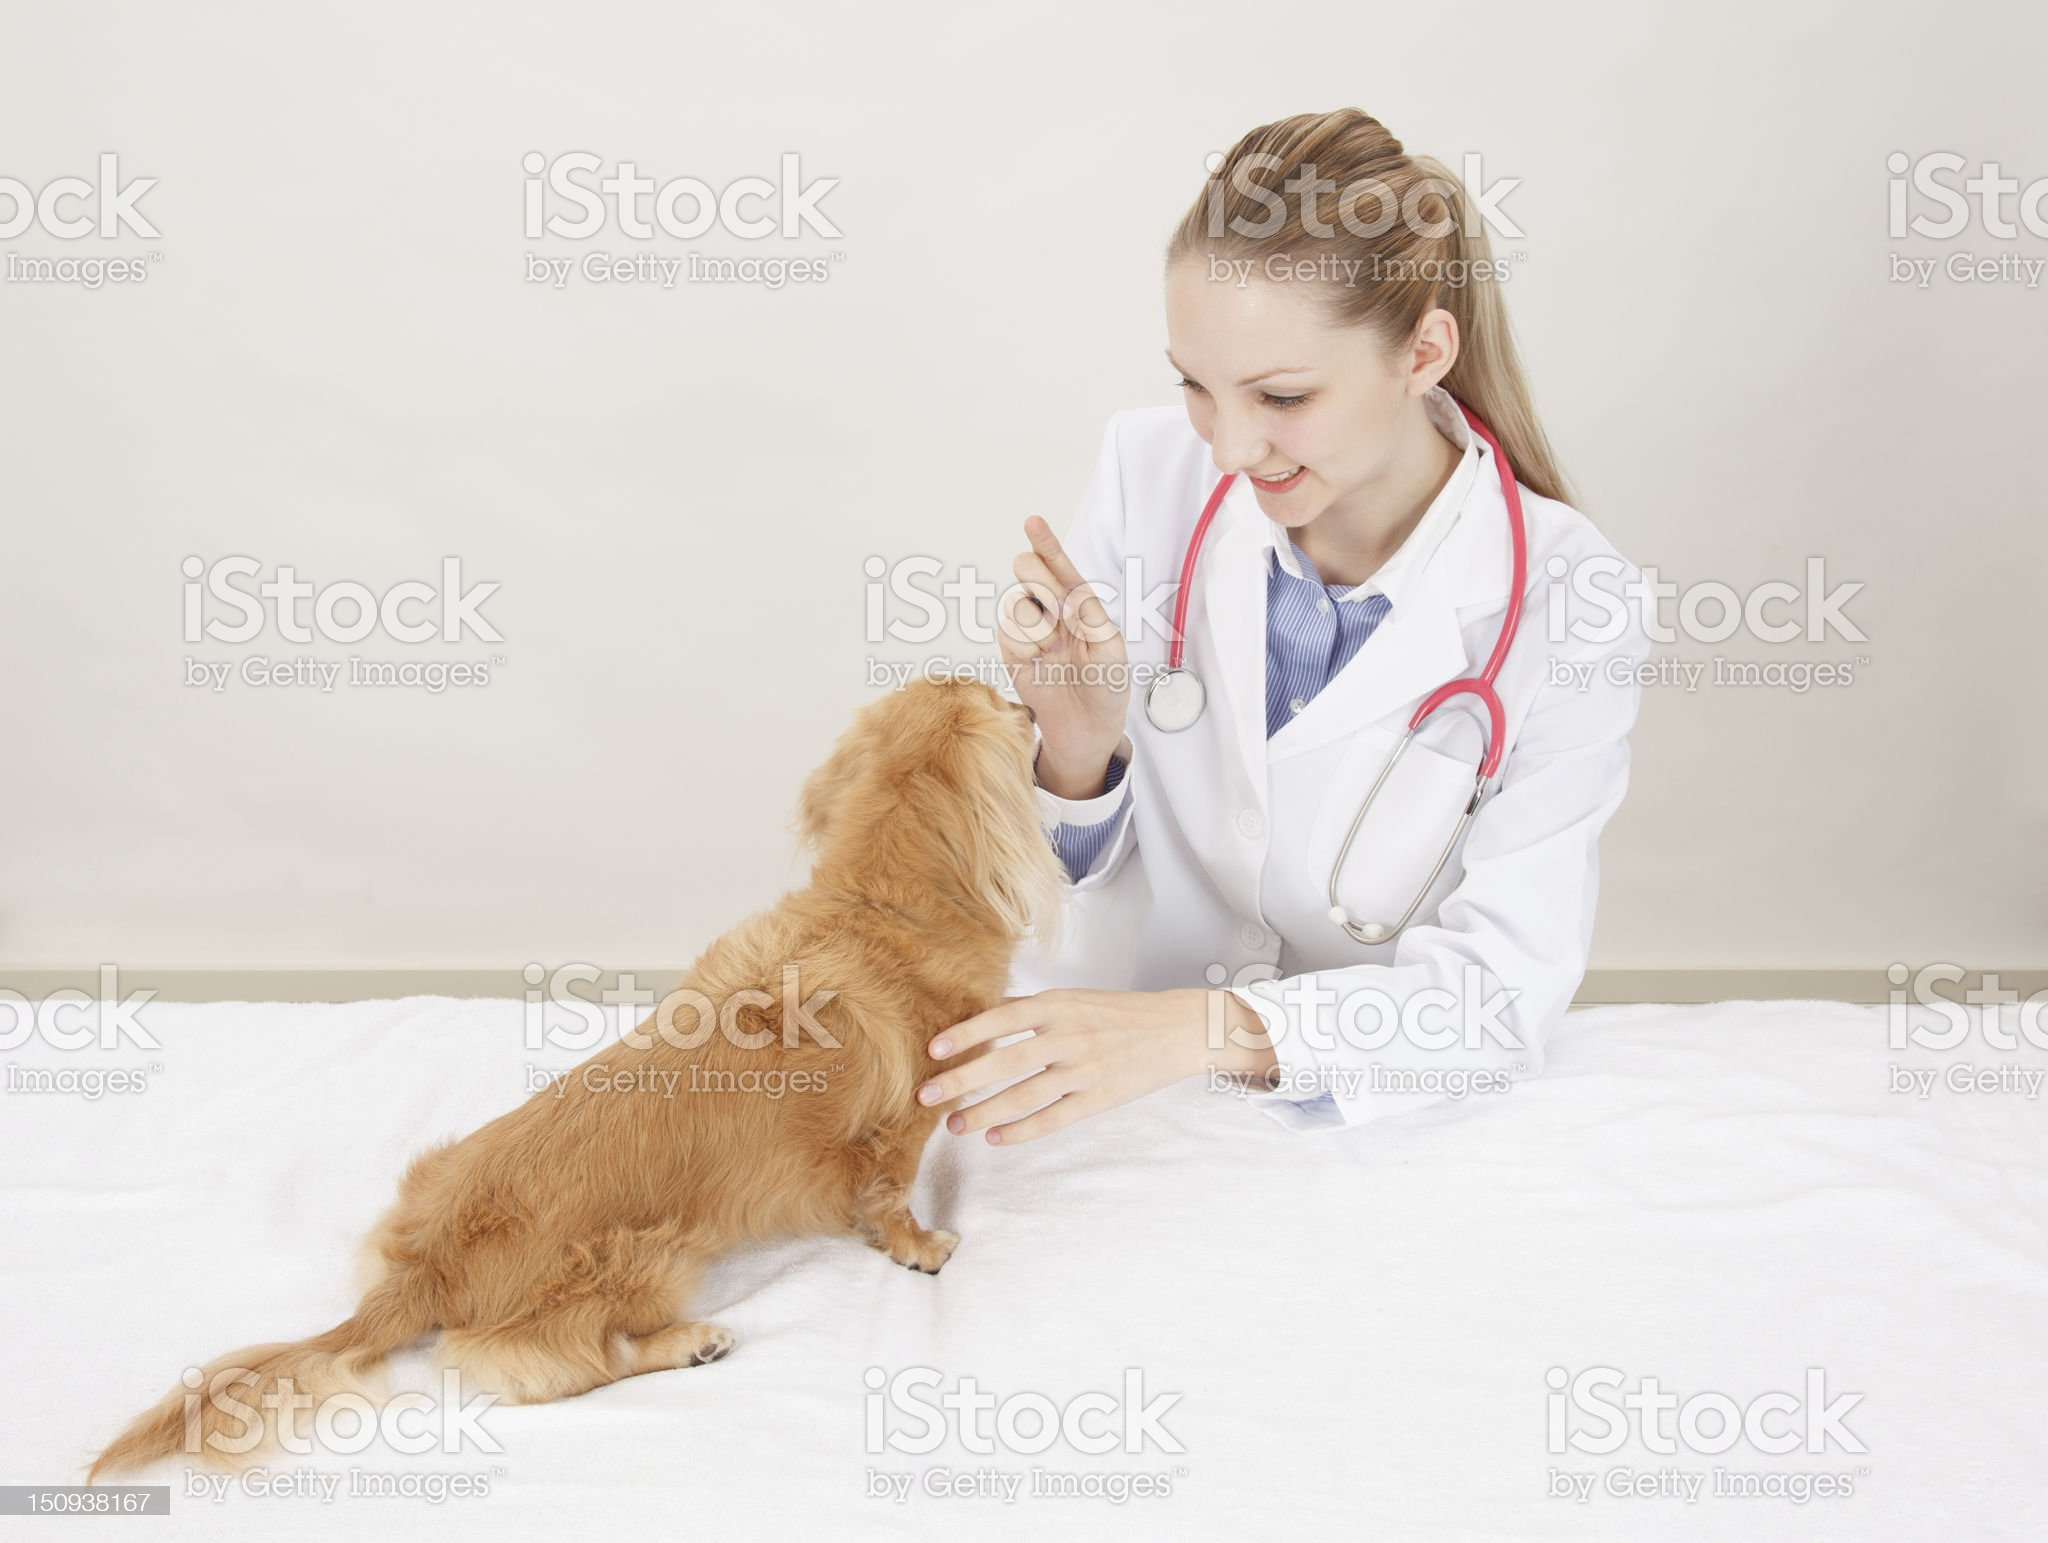 Veterinarian doctor royalty-free stock photo